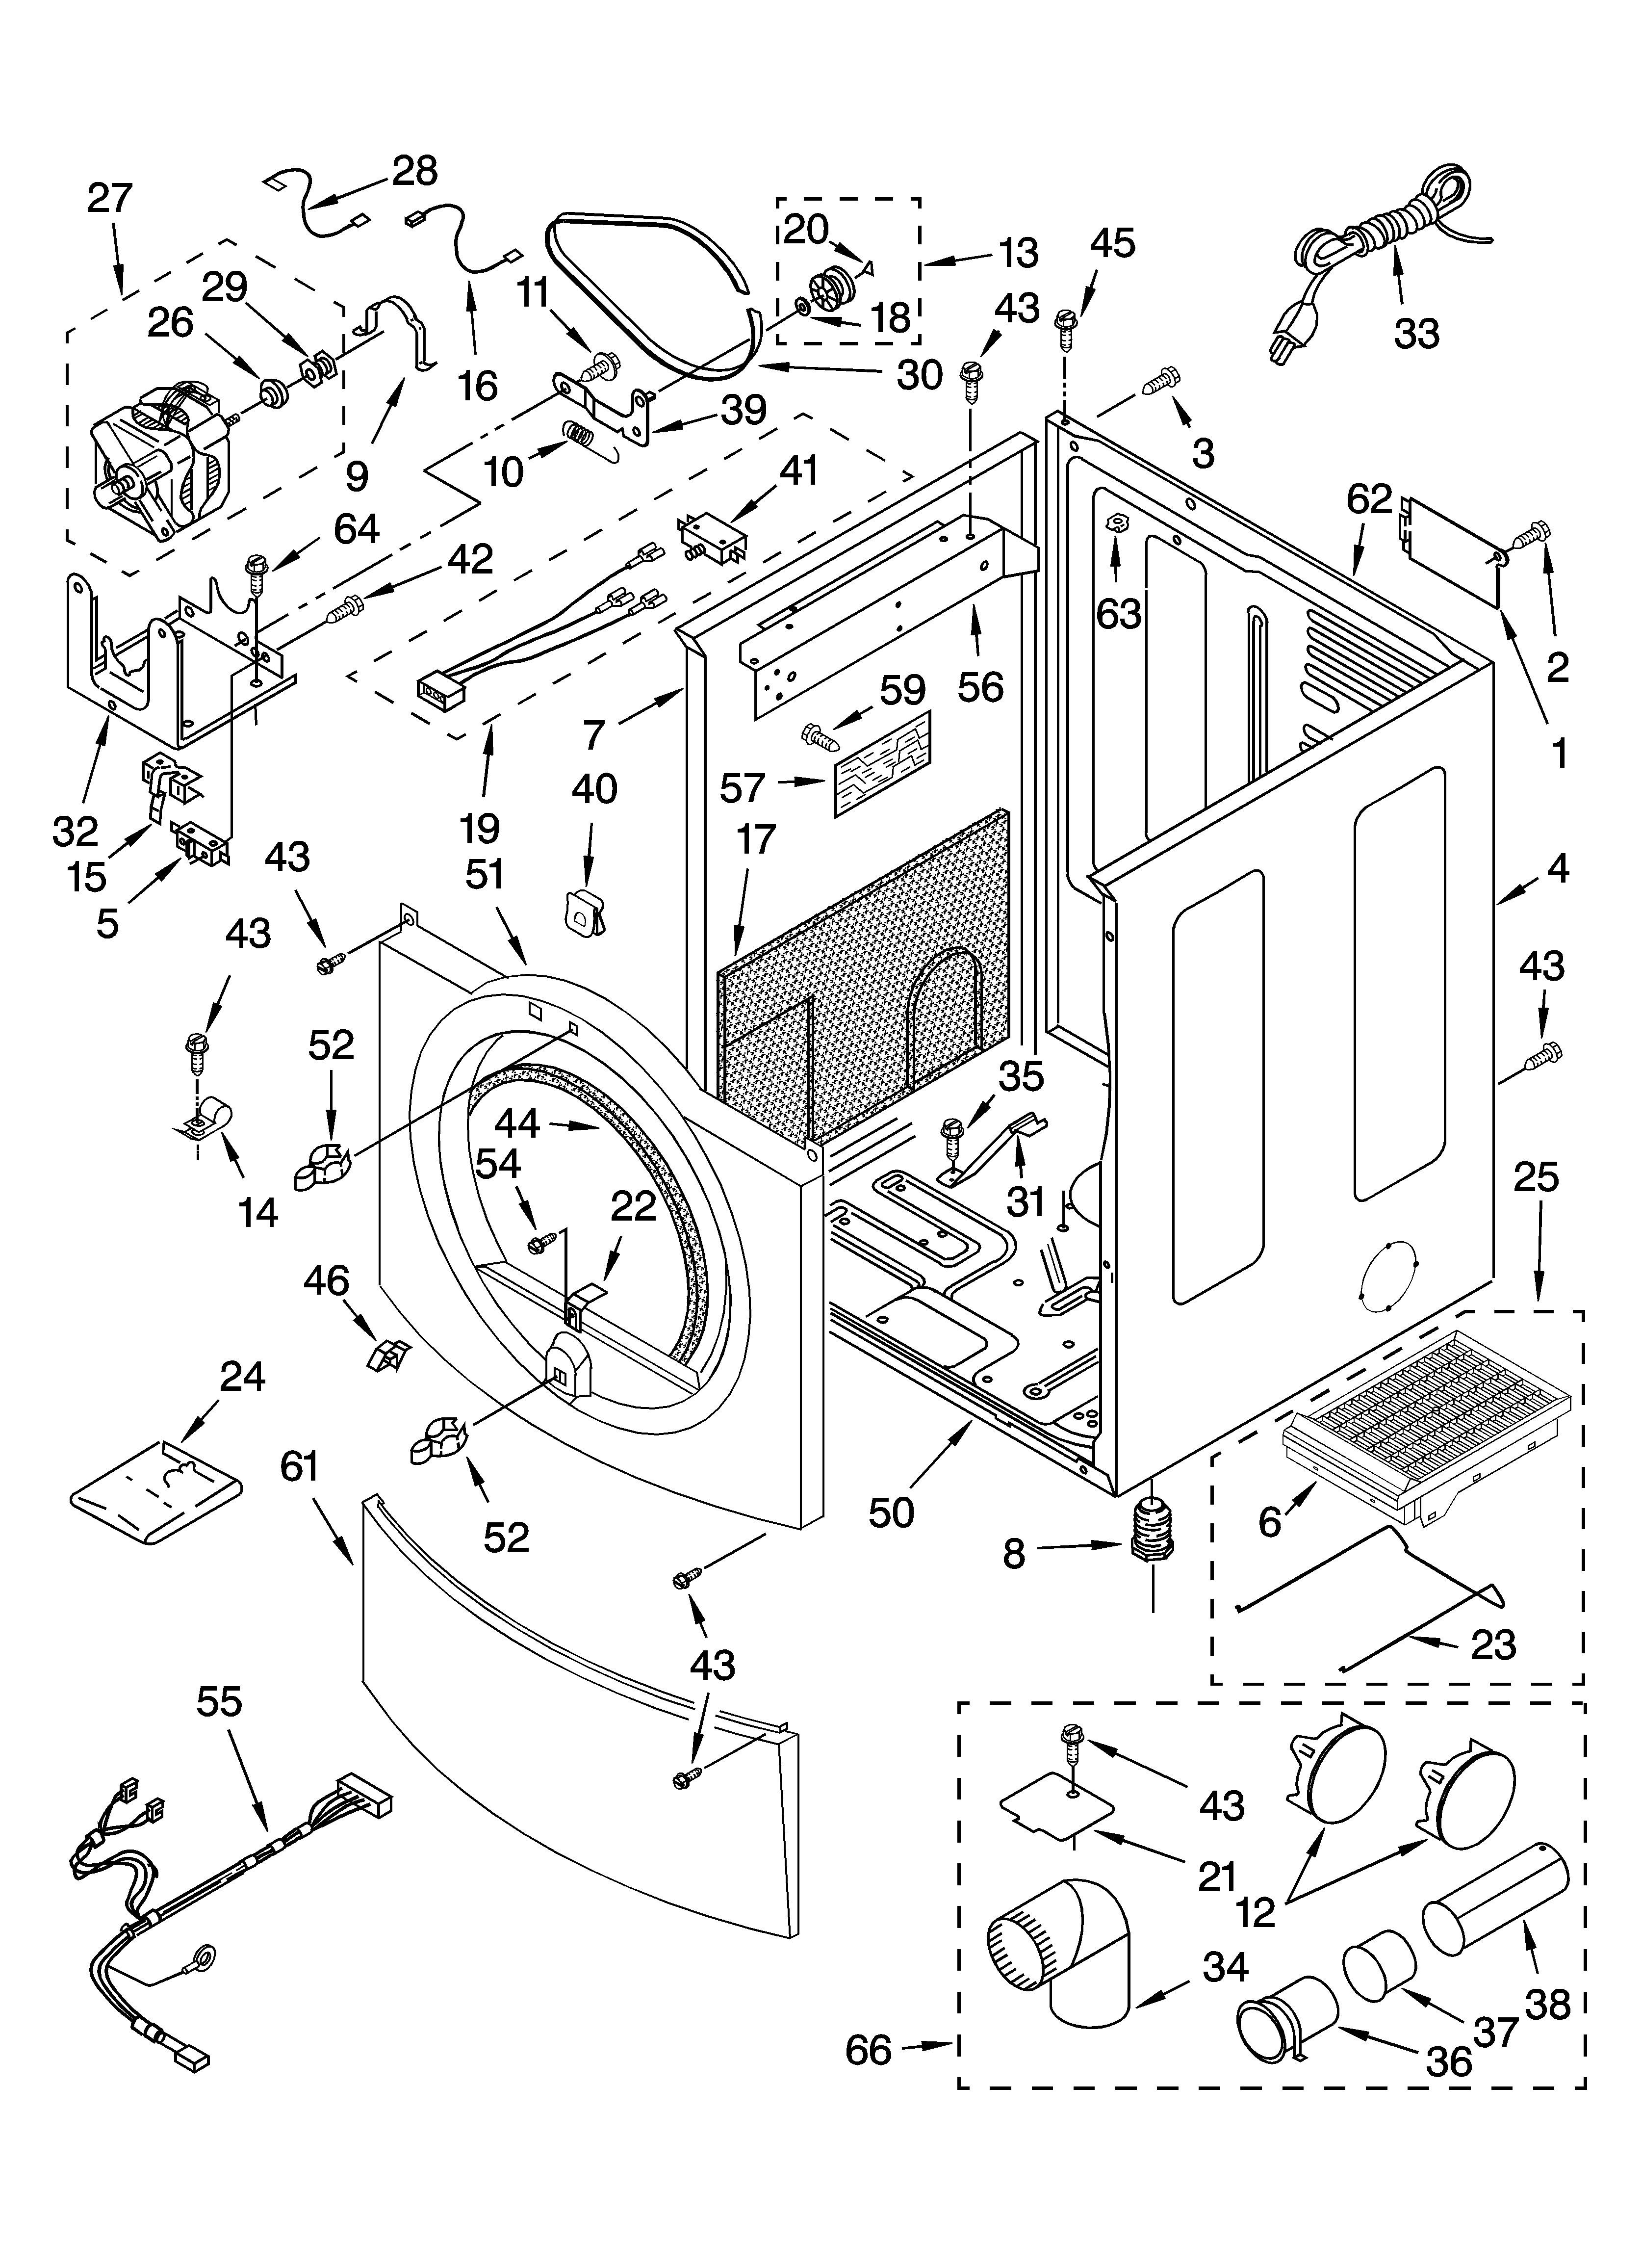 Admiral Dryer Parts Diagram Kenmore Elite Model Residential Dryer Genuine Parts Of Admiral Dryer Parts Diagram